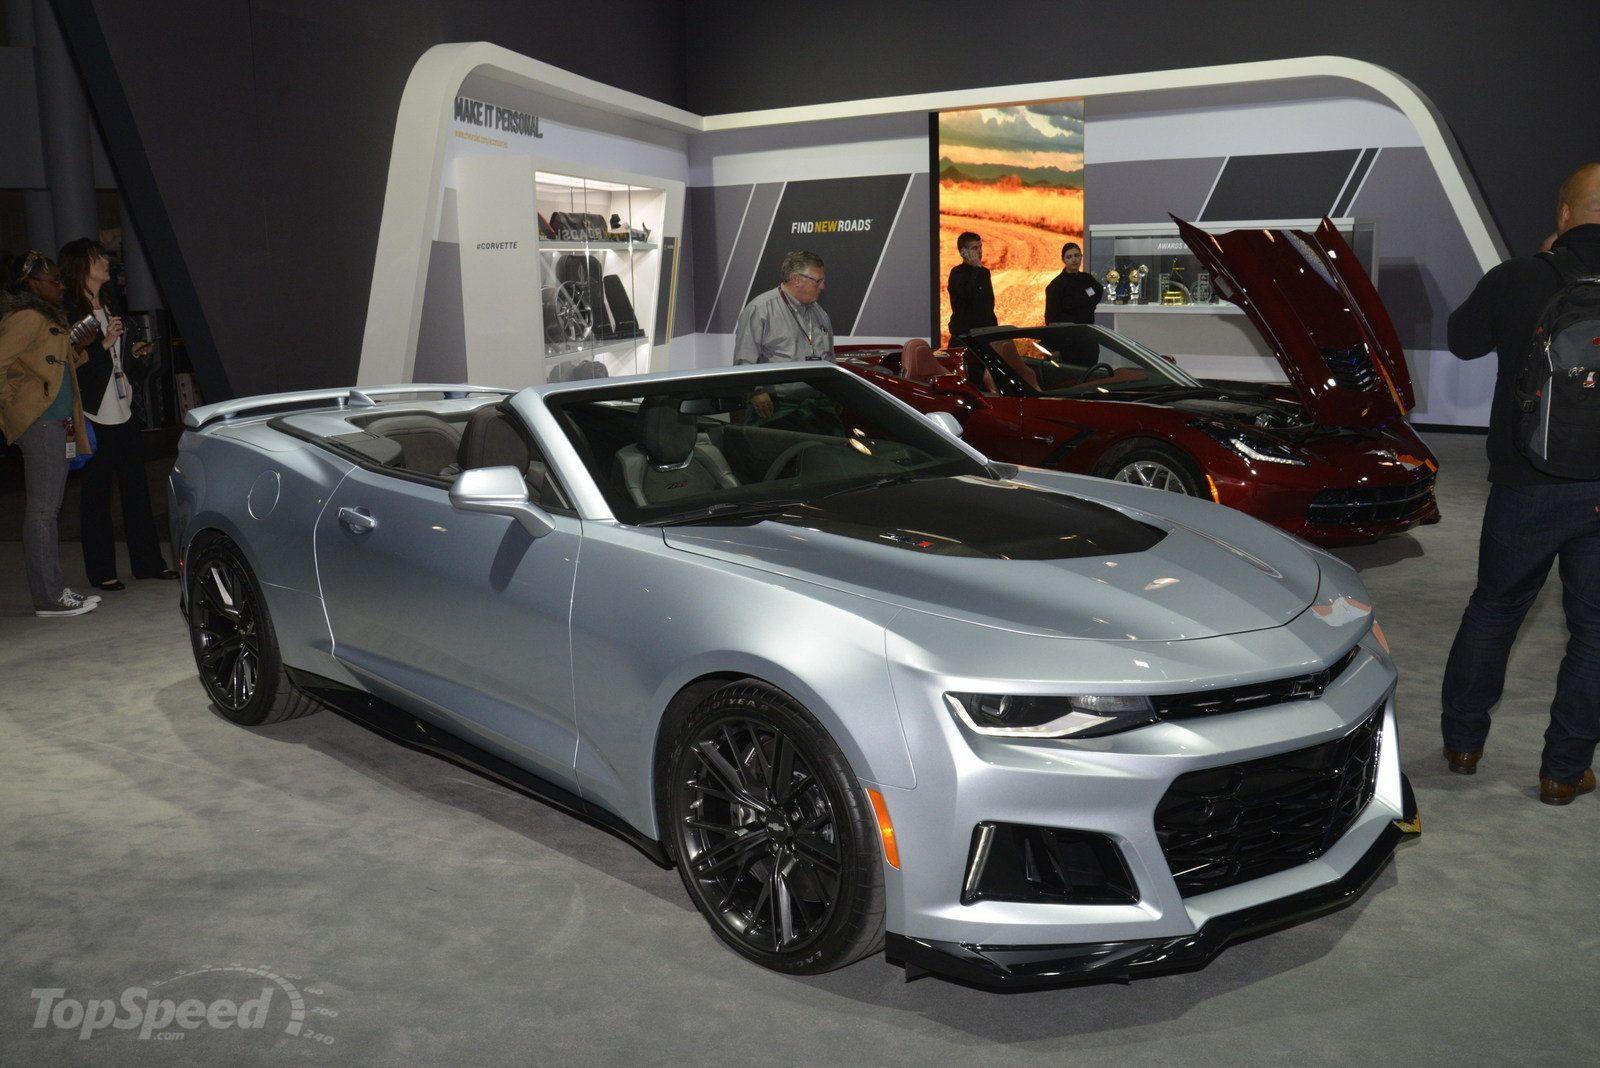 2014 zl1 camaro recaro seats html 2017 2018 cars reviews - The 25 Best New Camaro Z28 Ideas On Pinterest Chevrolet Camaro 1969 Camaro Ss Price And 2012 Camaro Ss